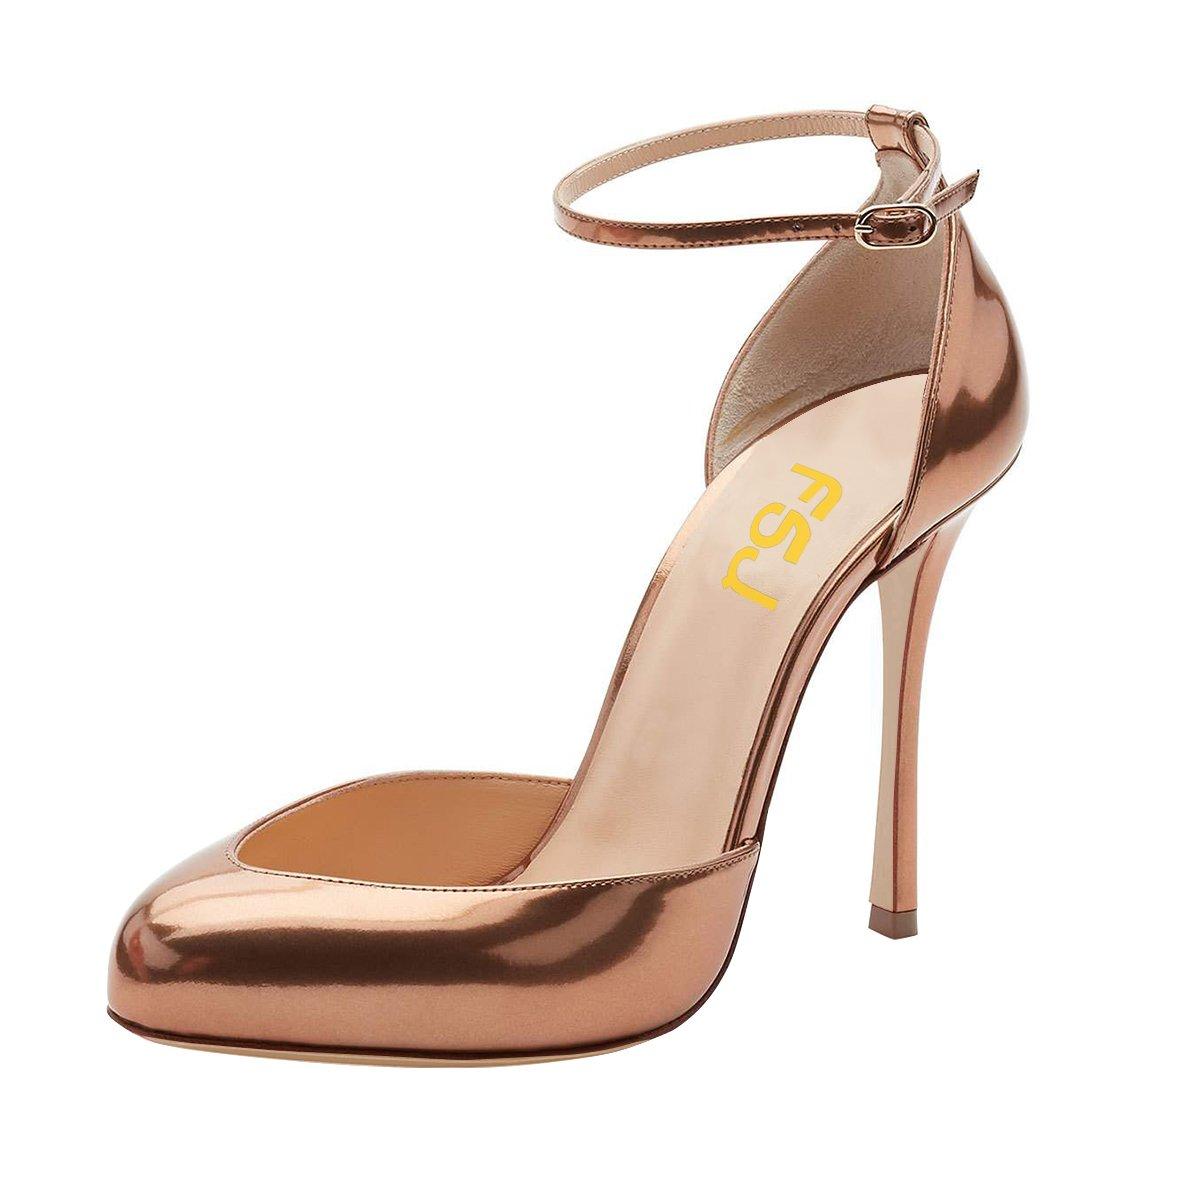 FSJ Women Fashion Almond Toe Ankle Strap D'Orsay Pumps High Heels Party Prom Sandals Size 4-15 US B0781RNB3R 7 B(M) US|Bronze